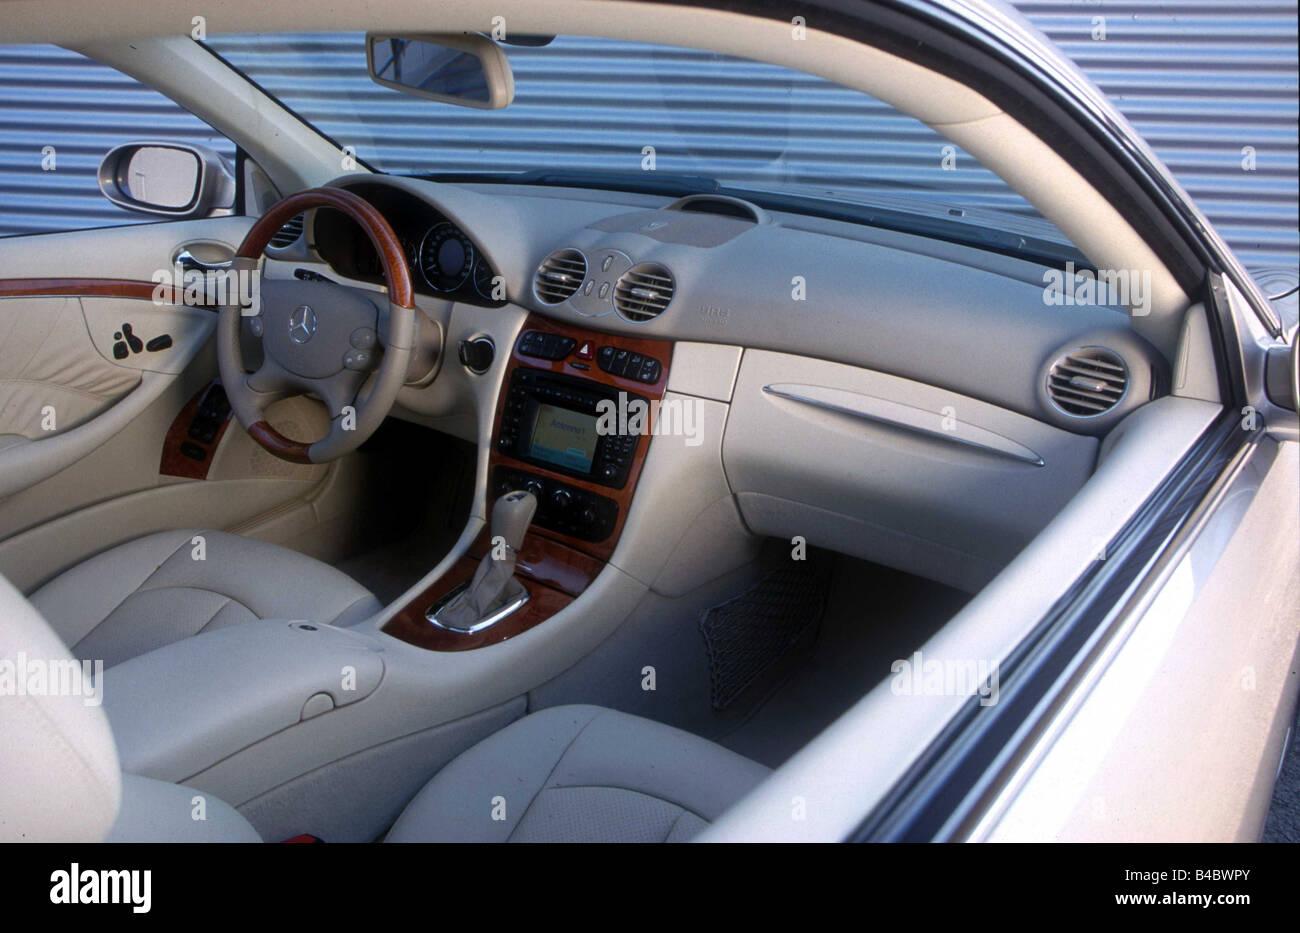 car mercedes clk 270 cdi coupe roadster model year 2002. Black Bedroom Furniture Sets. Home Design Ideas